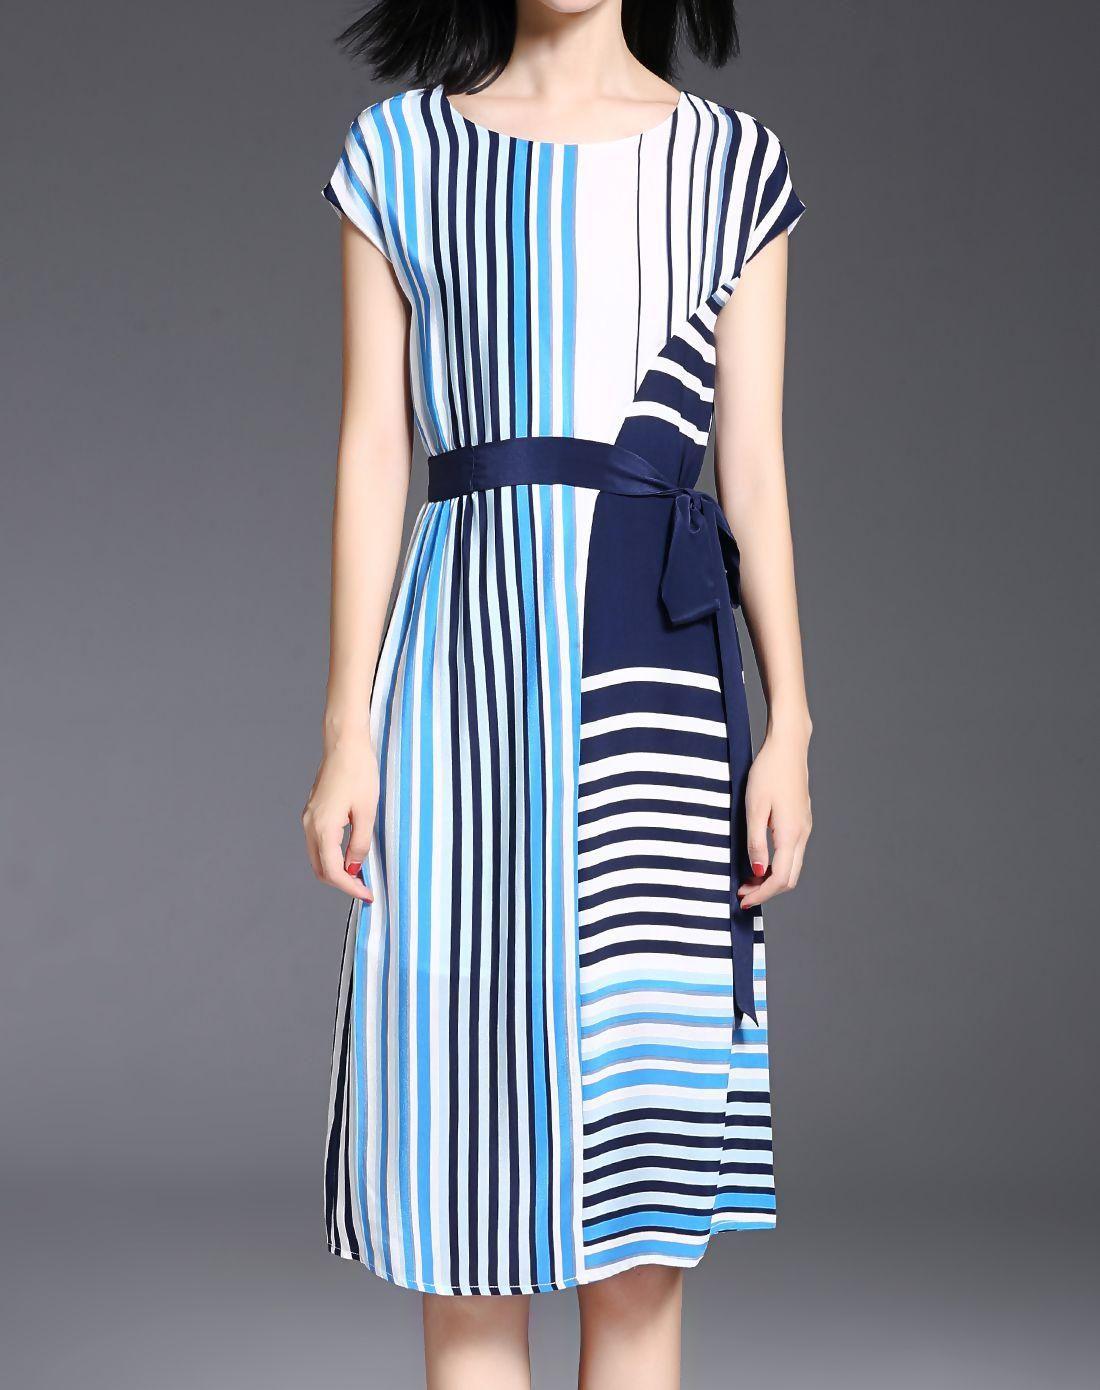 Adorewe vipme vipshop global missshine blue silk paneled stirpes